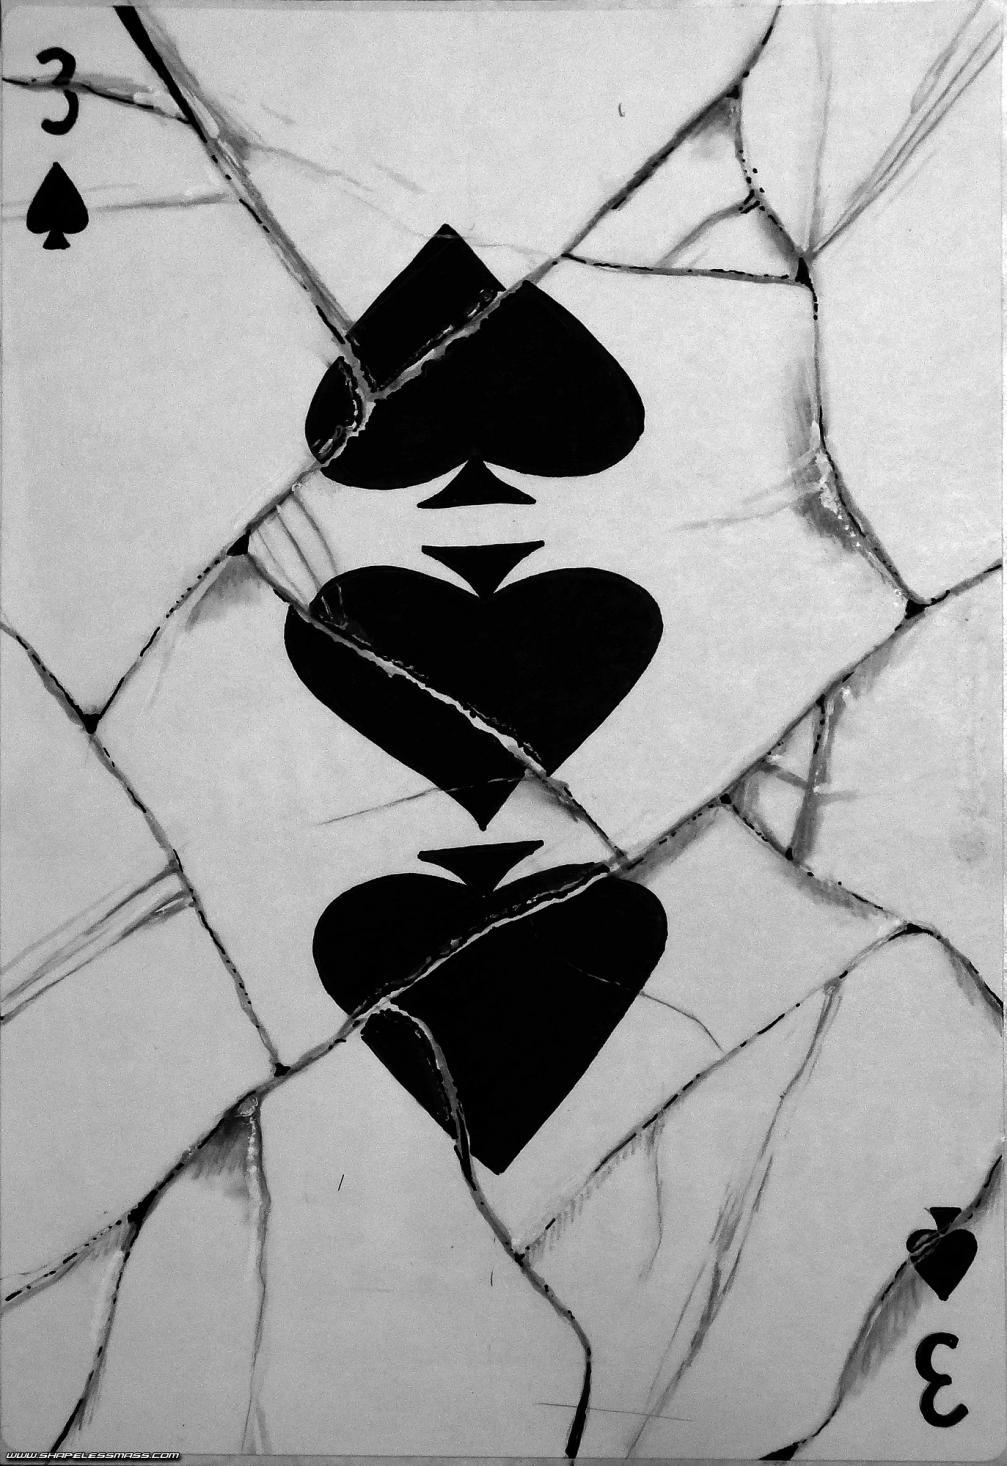 3 of spades.jpg